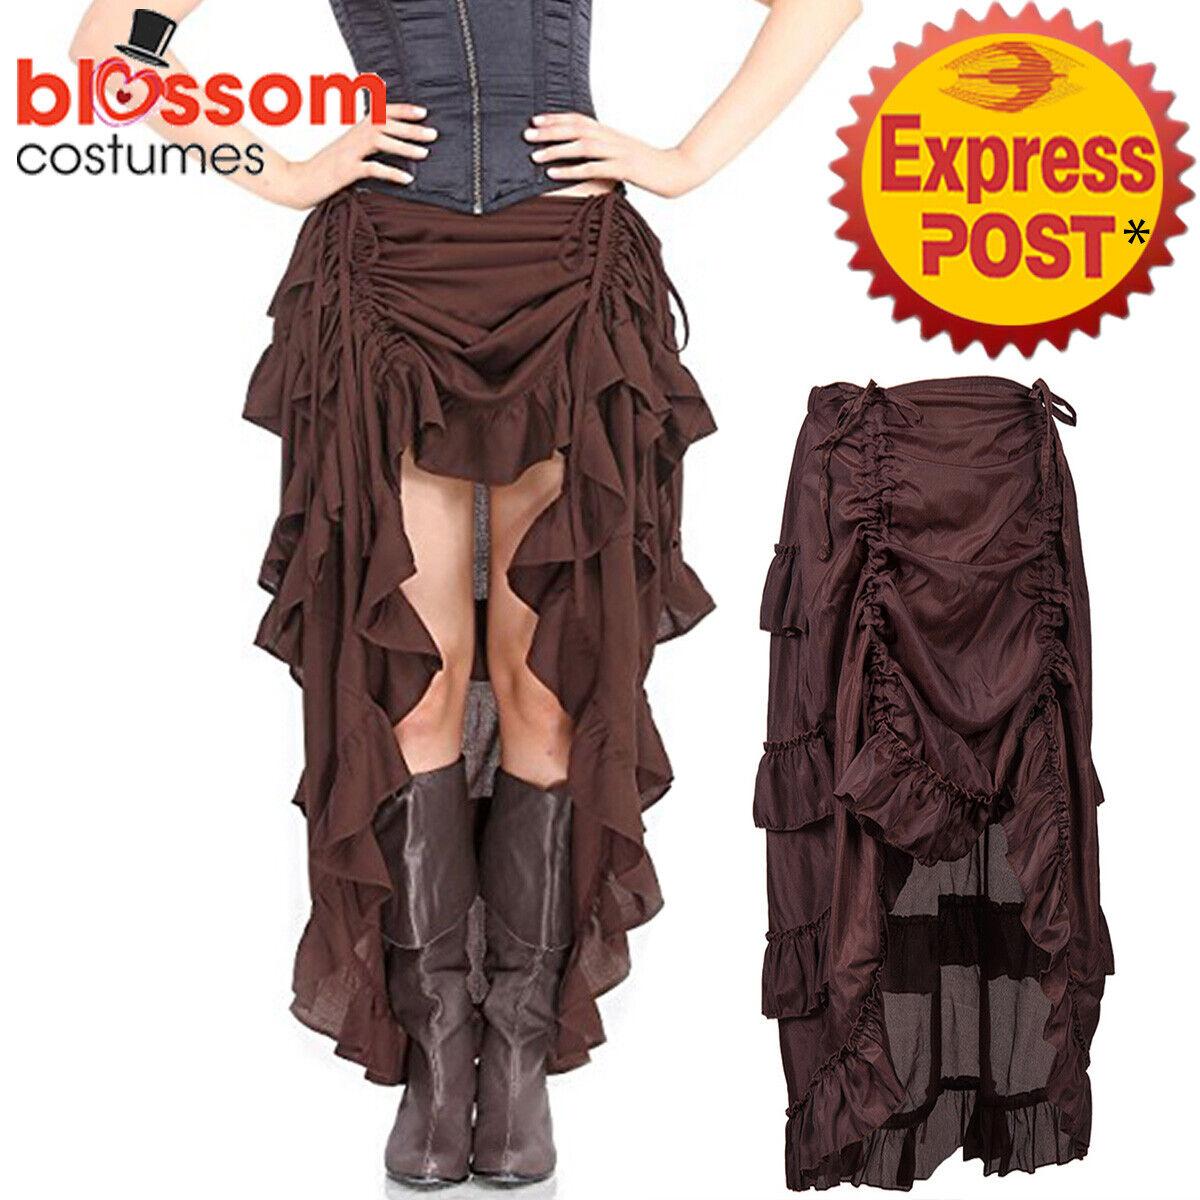 K631 Brown Steampunk Goth Gypsy Vintage Ruffle Rockabilly Vintage Skirt Costume